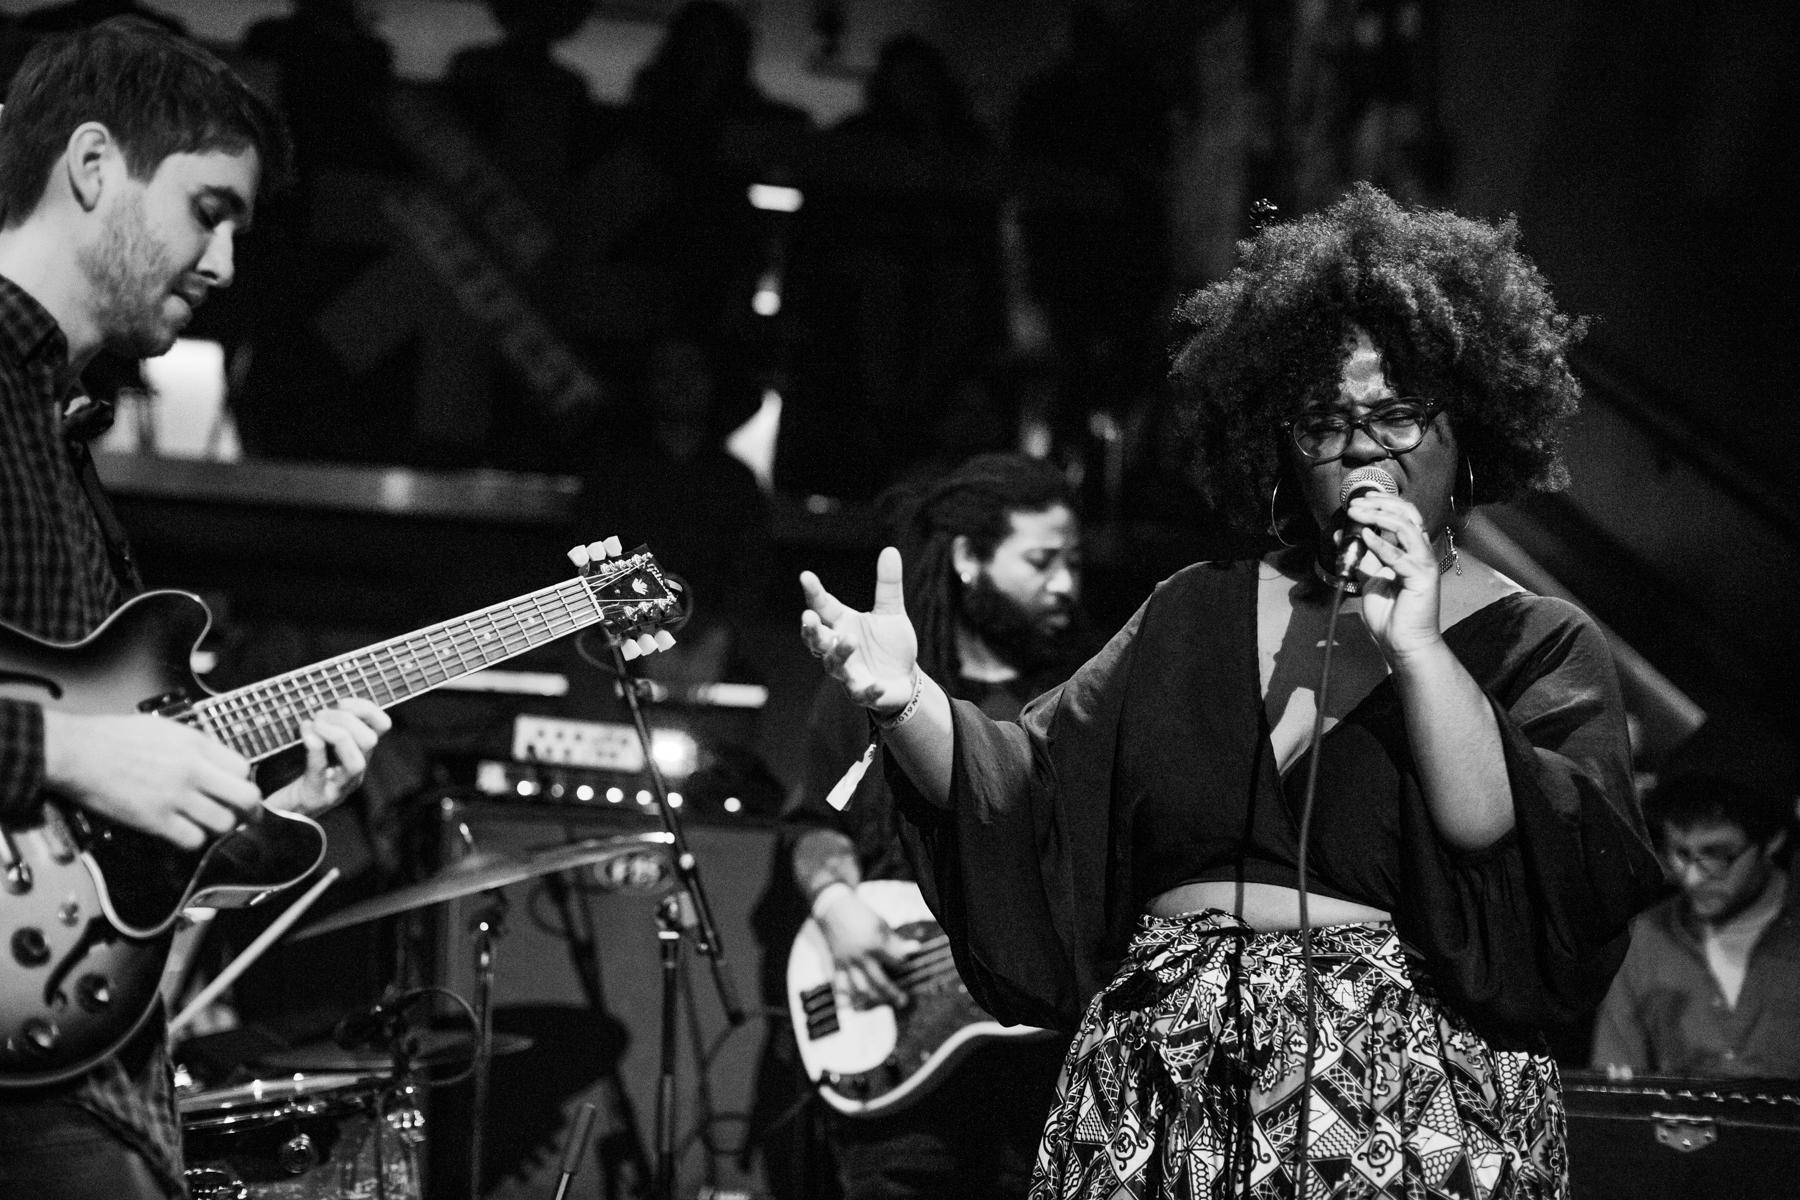 15th Annual New York City Winter Jazz Fest  New York, New York  Jan 12, 2019    Photo by Kristie Kahns